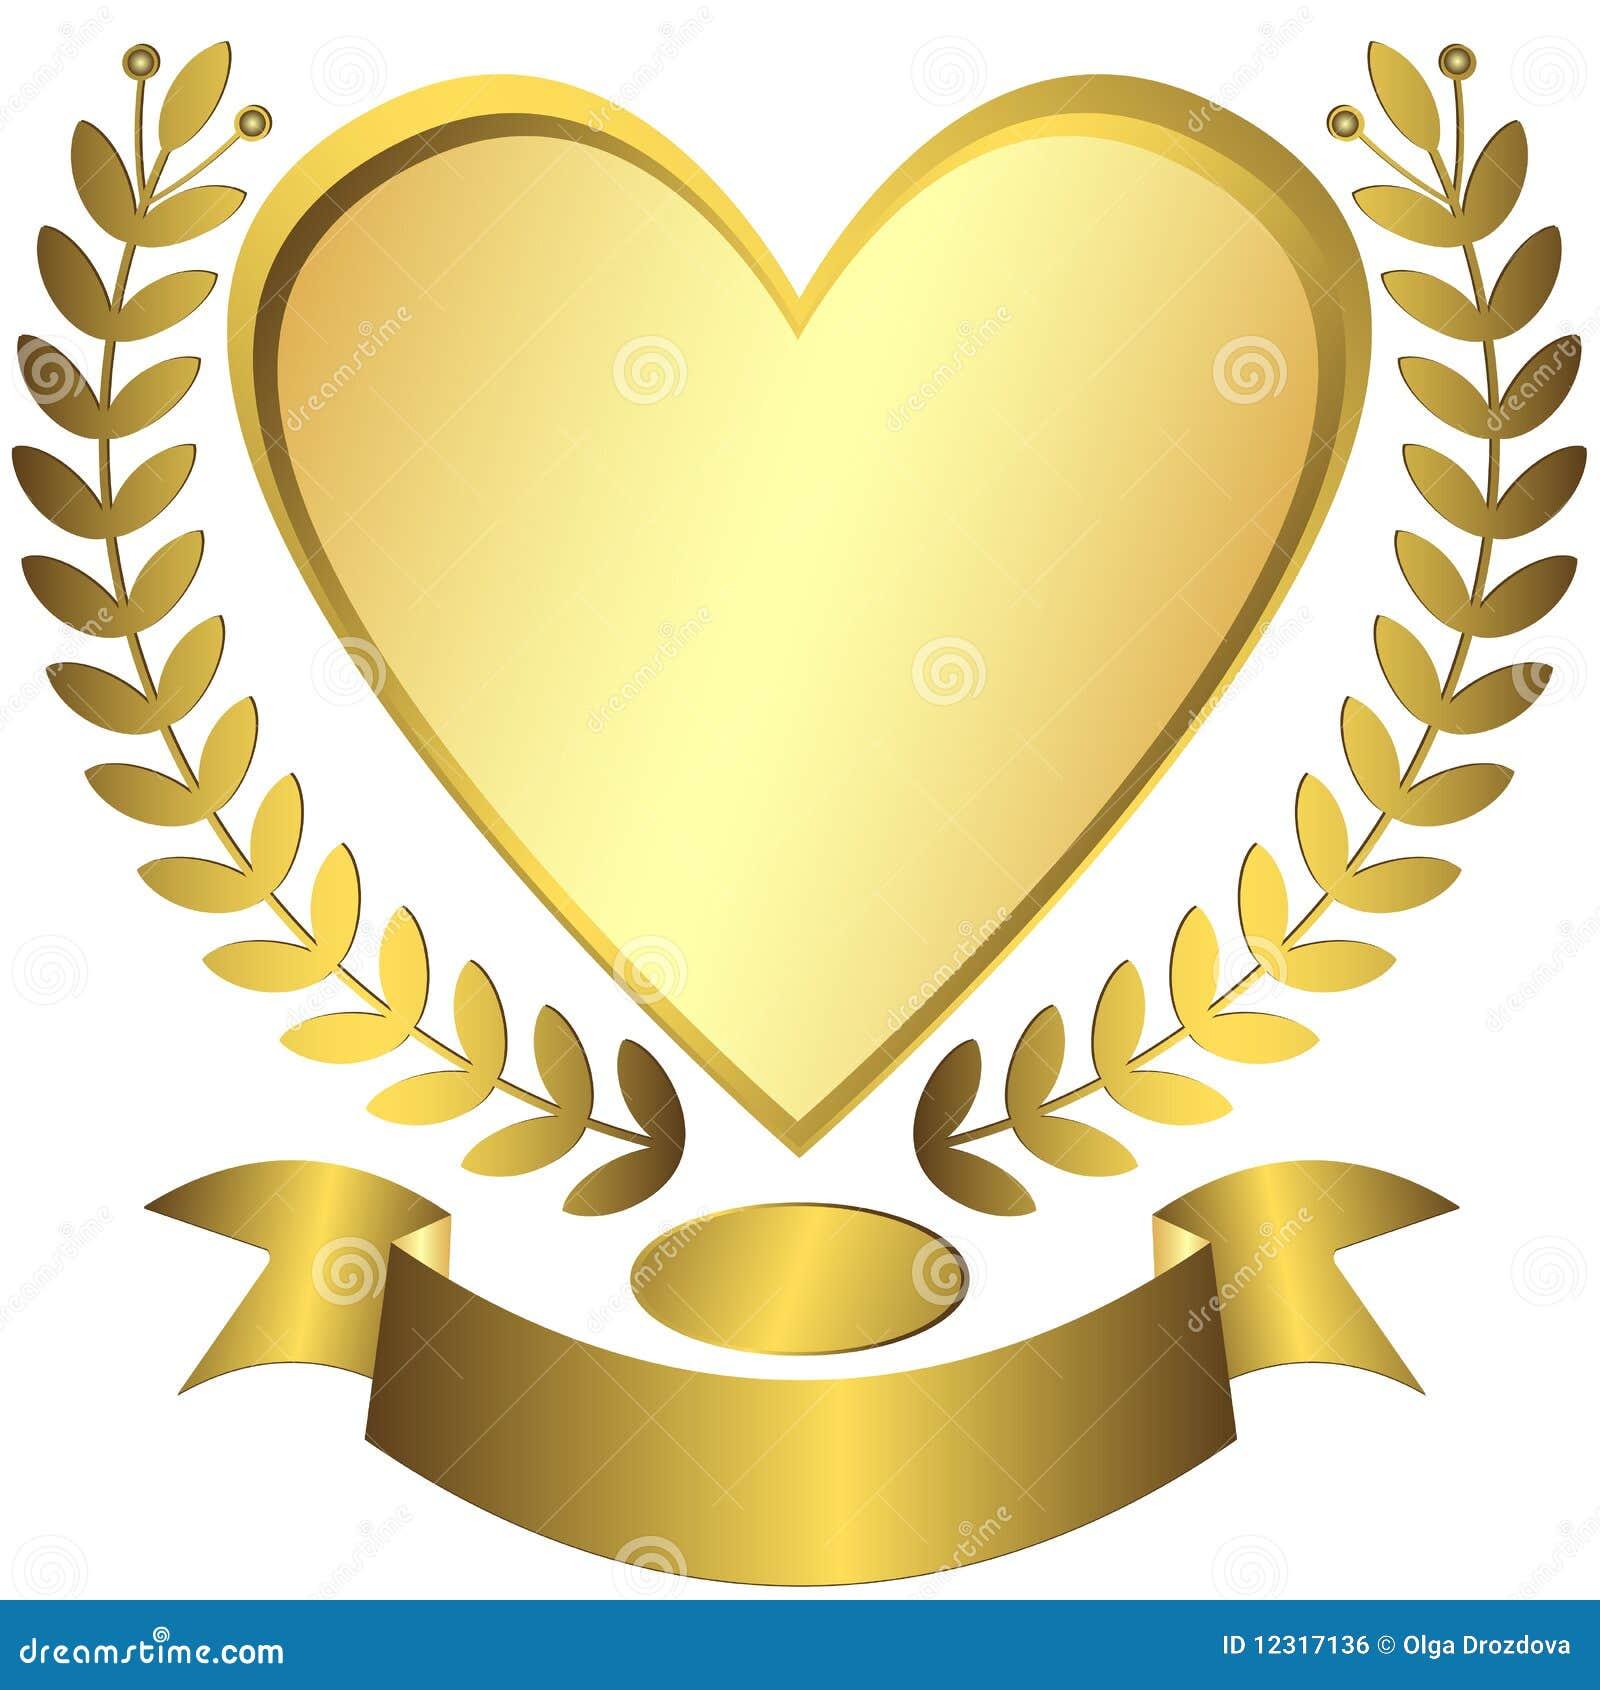 Gold Award Heart With Ribbon Vector Royalty Free Stock